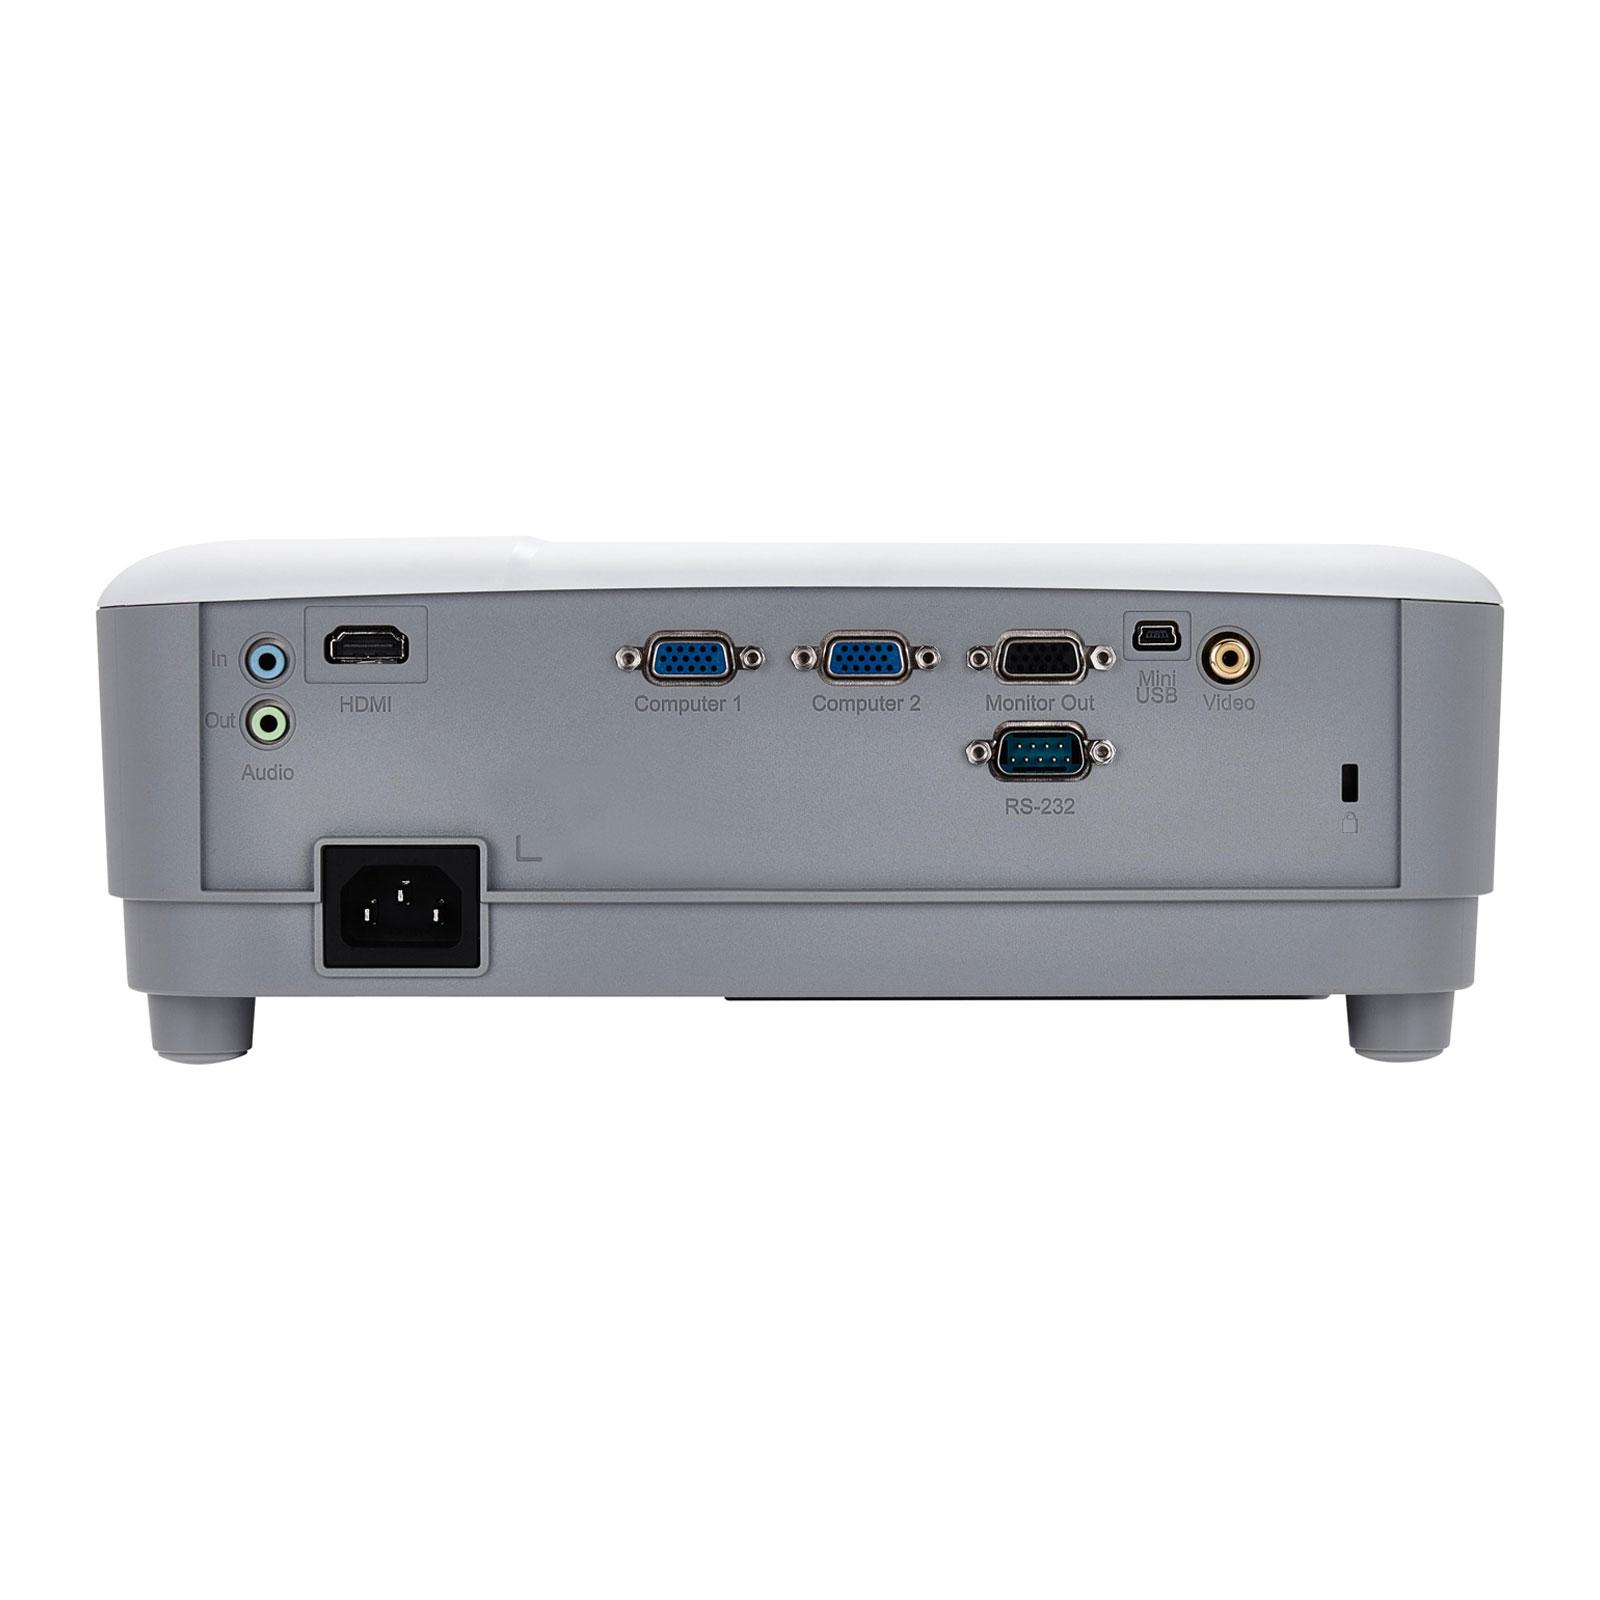 ViewSonic PA503S - Vidéoprojecteur ViewSonic - Cybertek.fr - 1